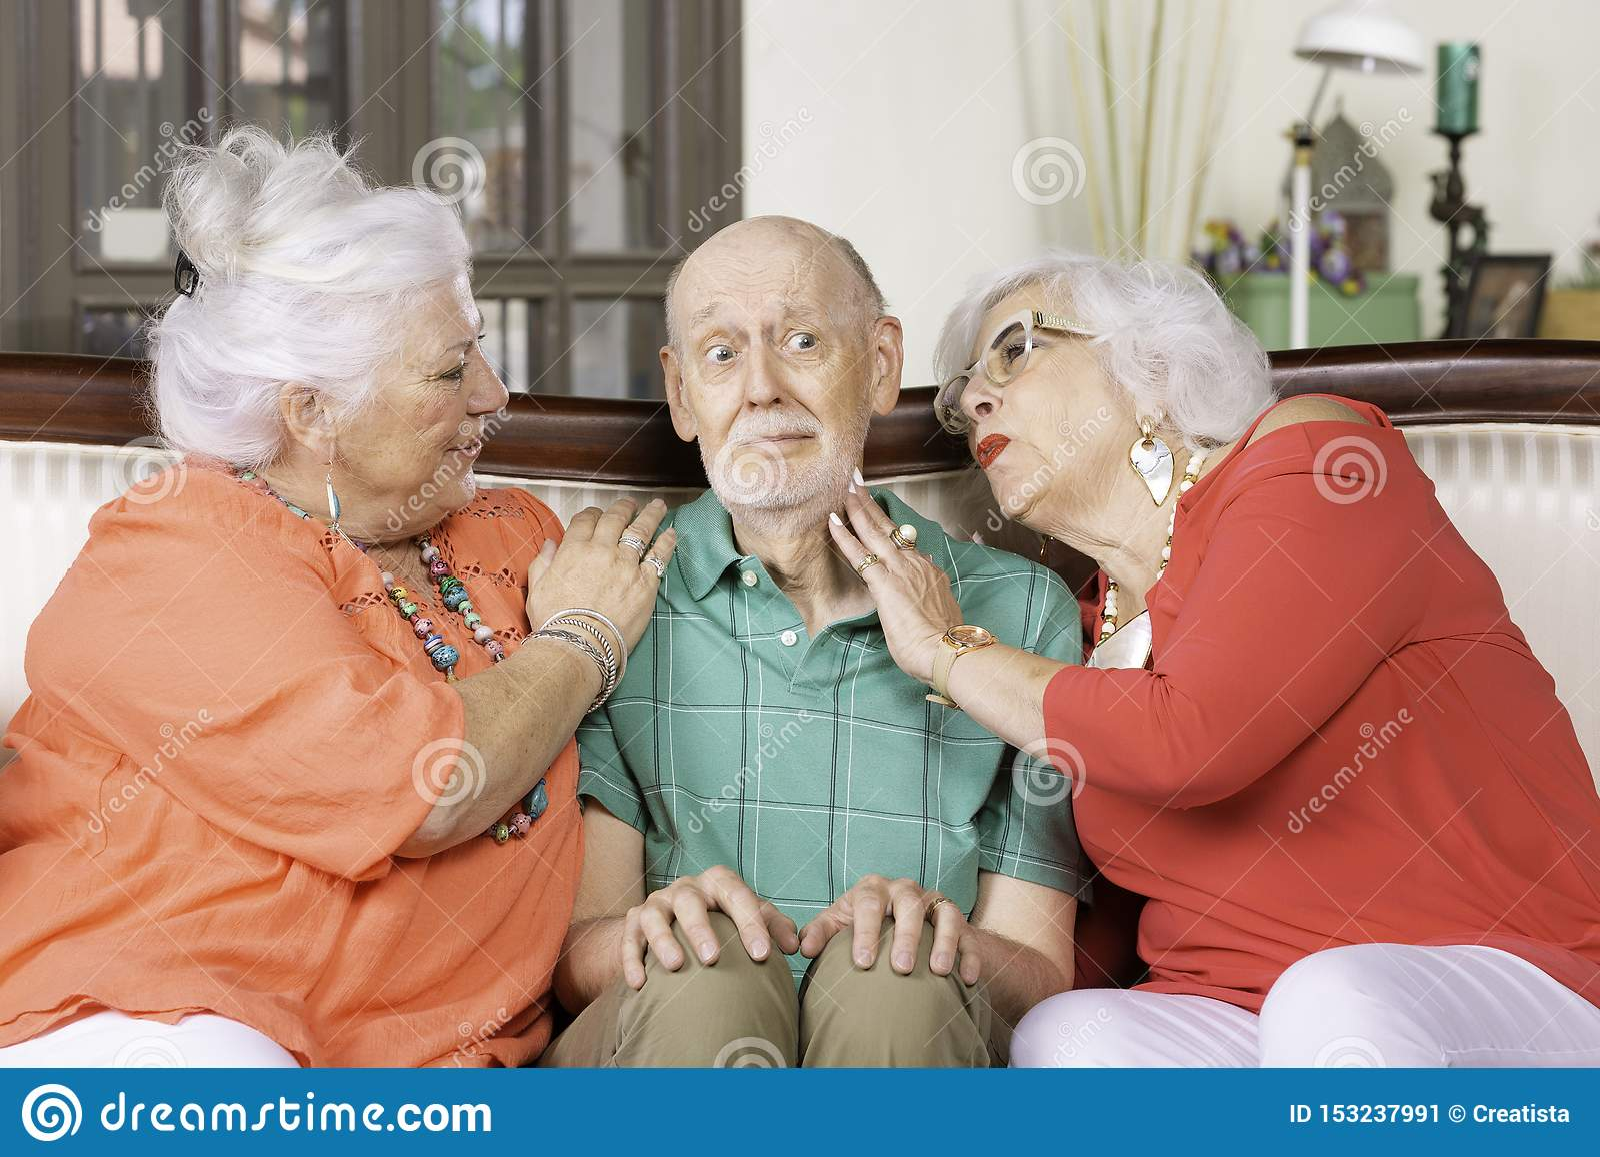 Frauen bilder ältere Ältere Frau